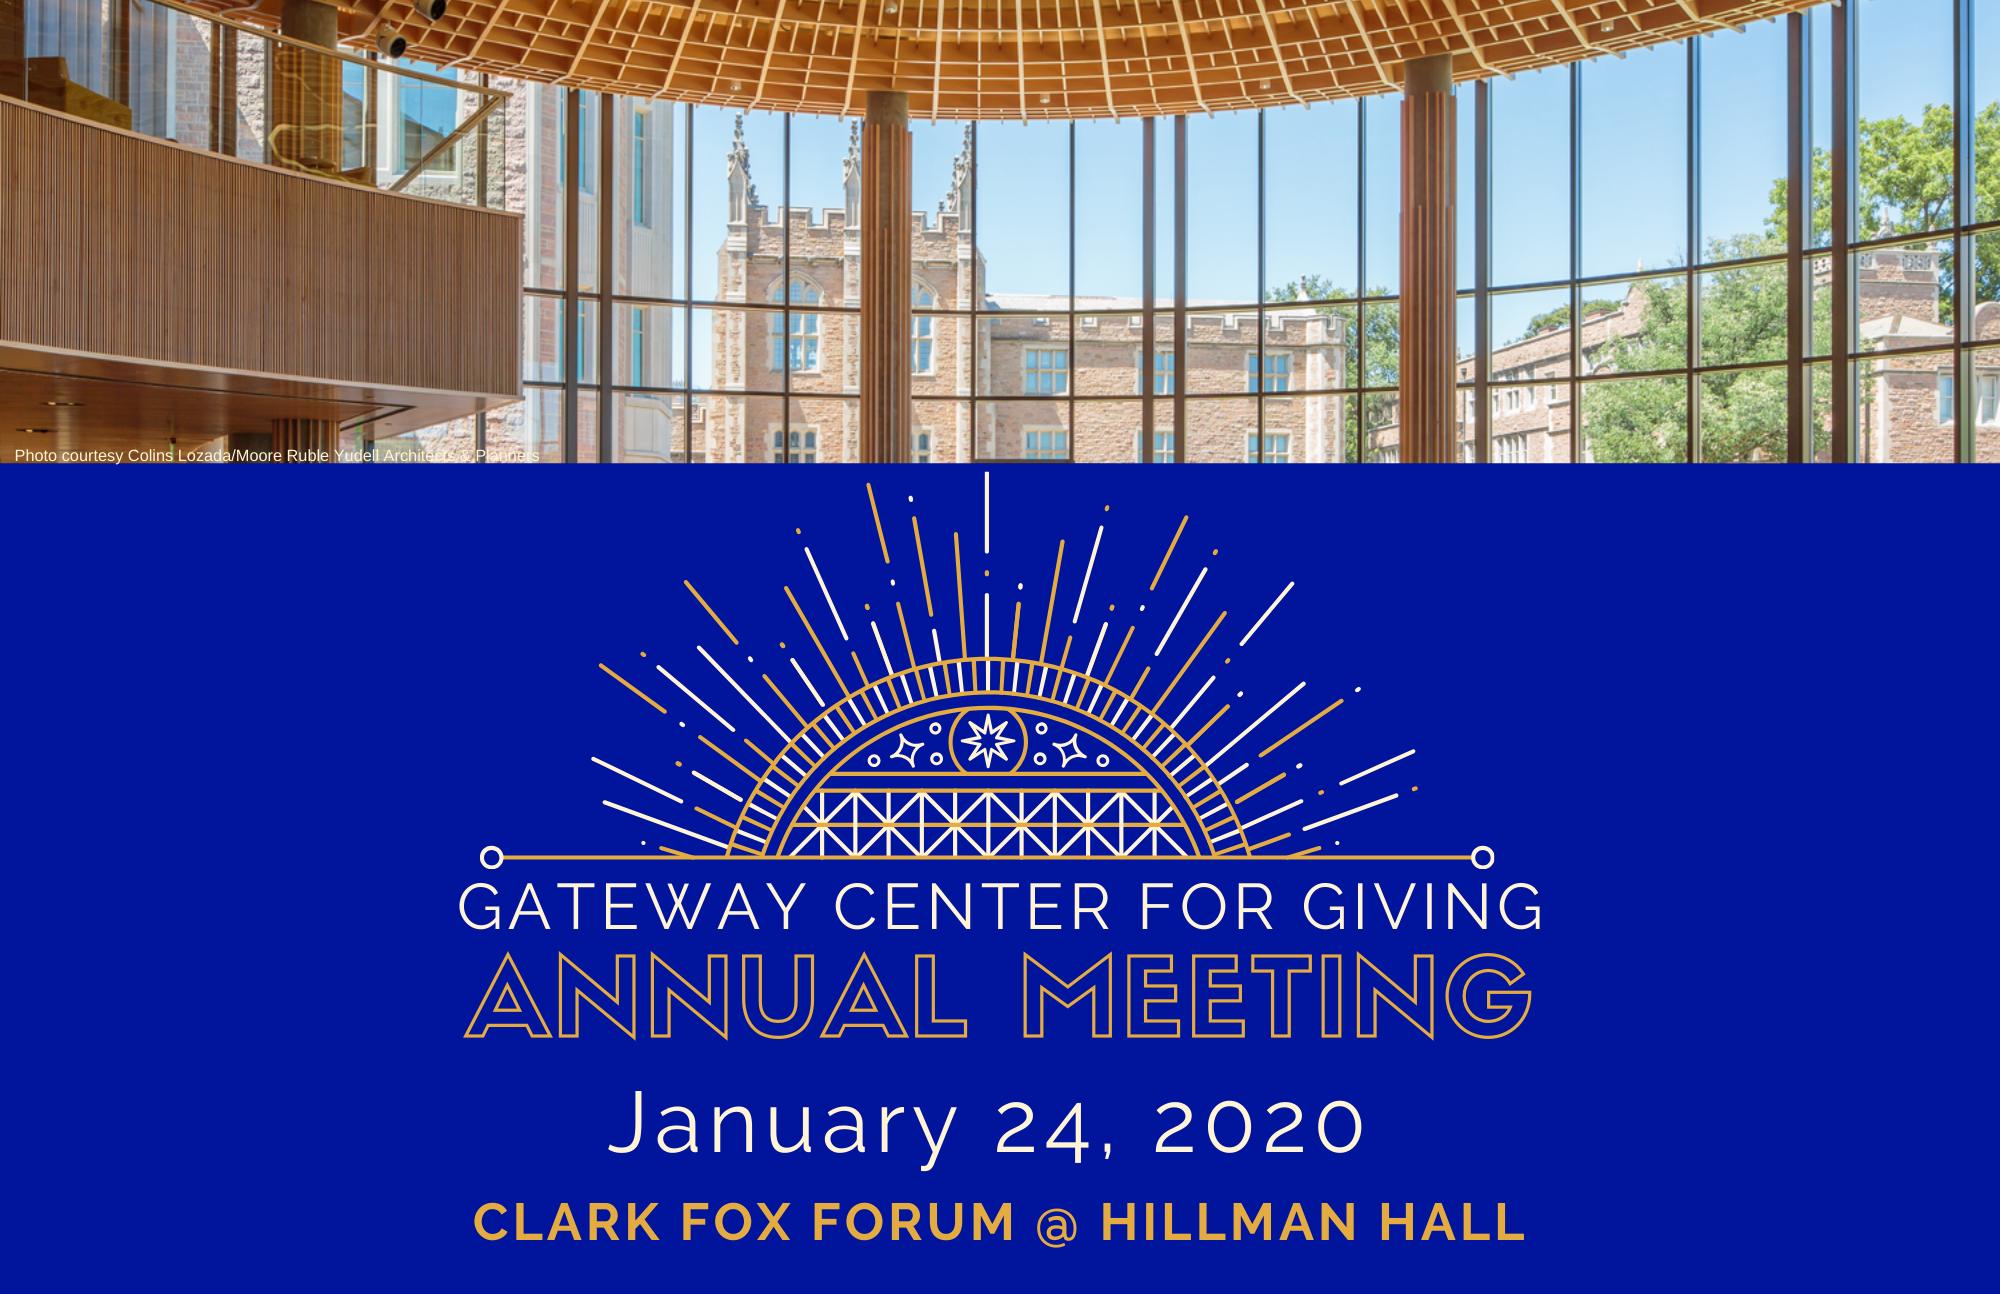 GCG Annual Meeting Invitation Cover